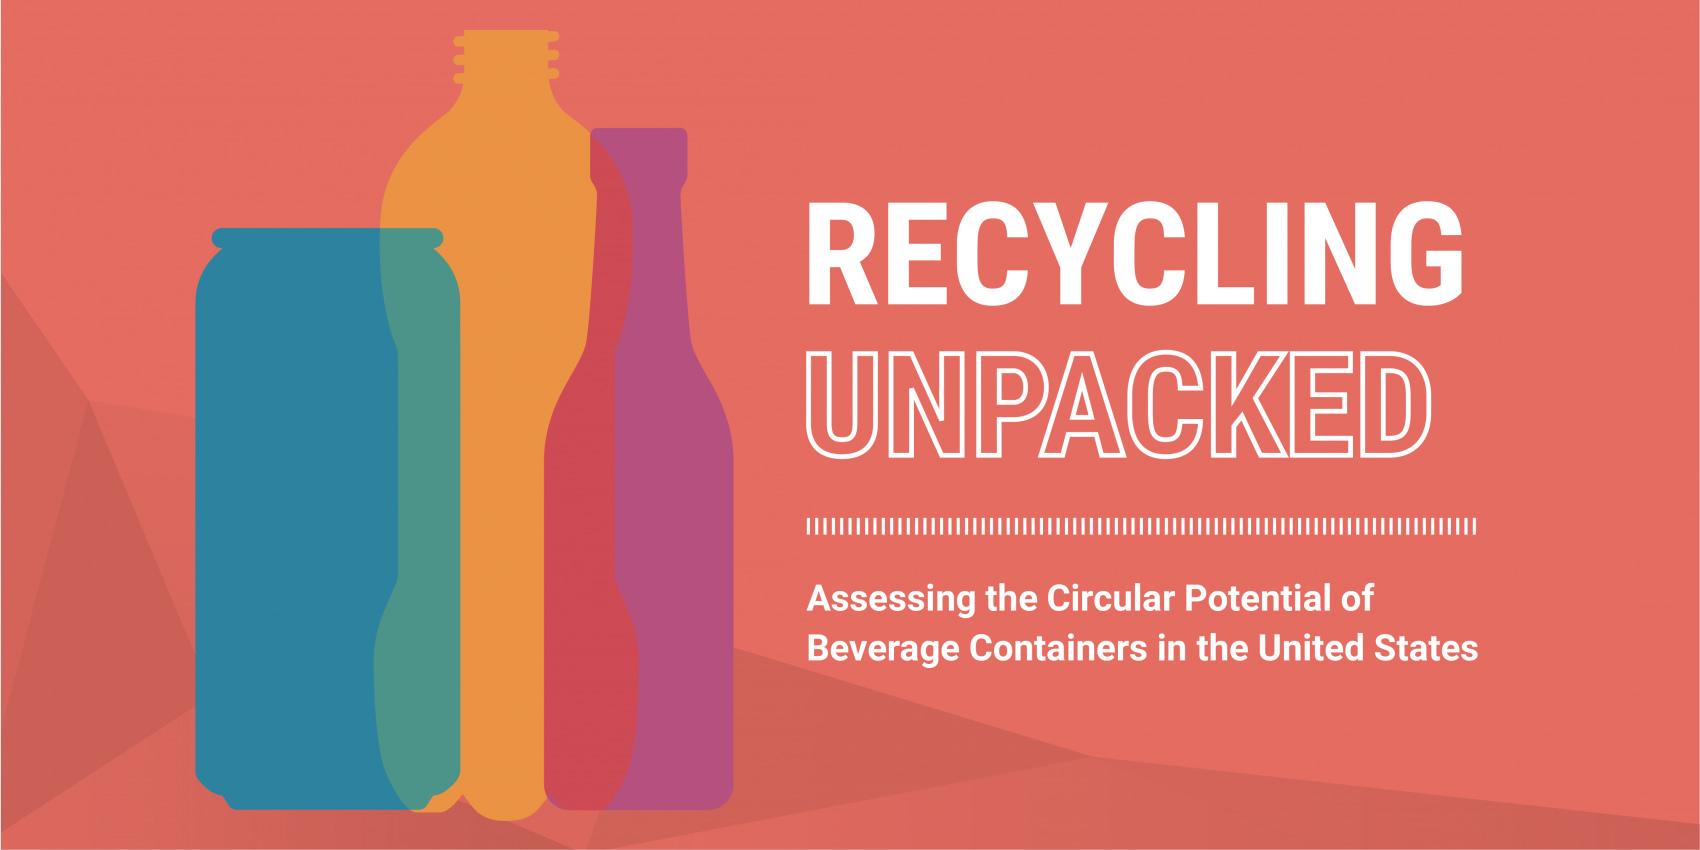 RecyclingUnpacked_SocialMedia_Post 1_COVER_v09_LPZ hr